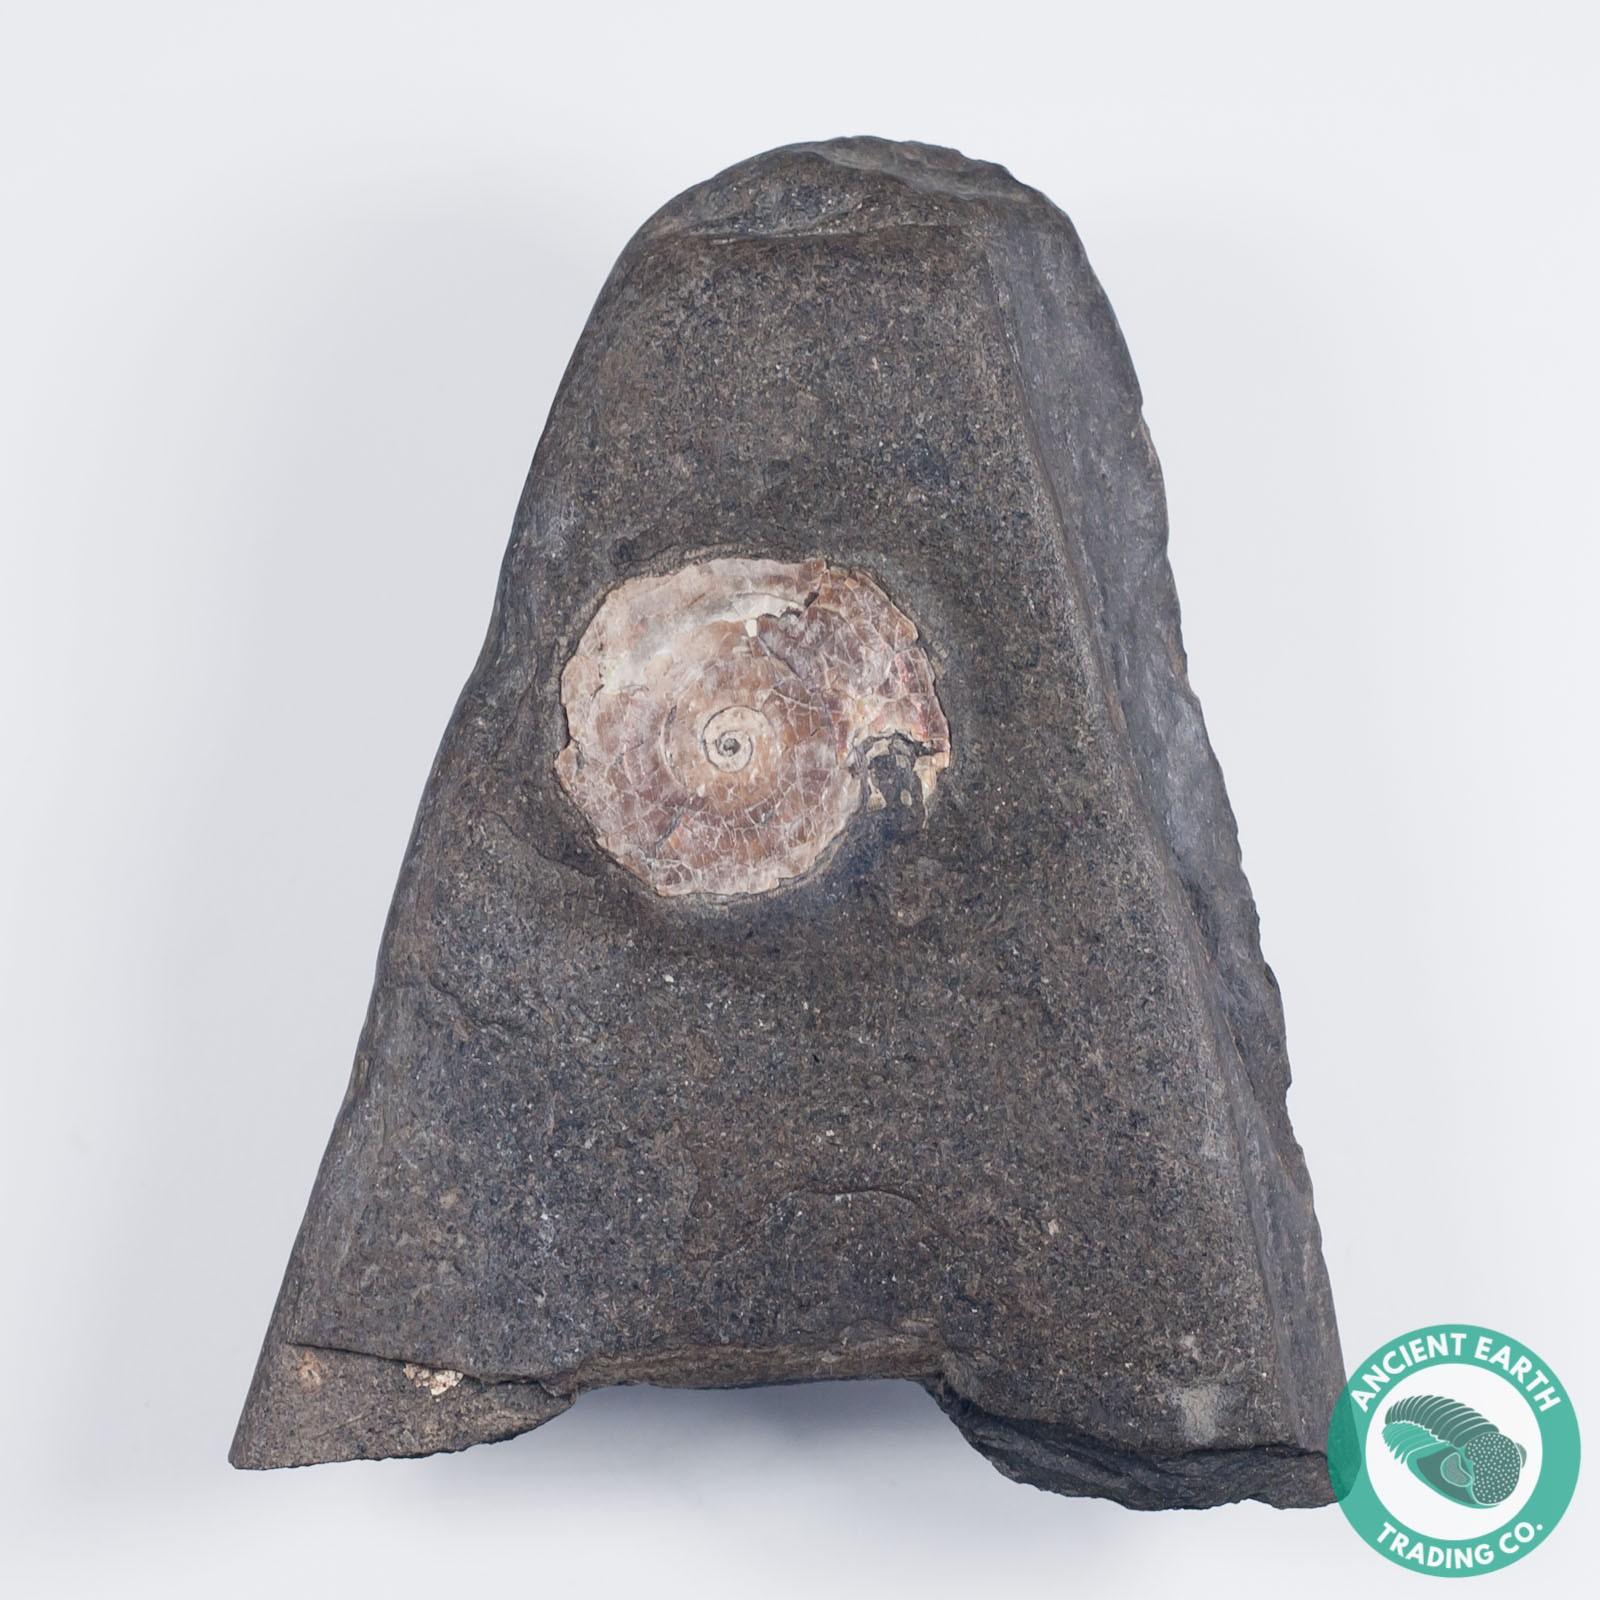 1.02 in Bright Psiloceras Ammonite - England